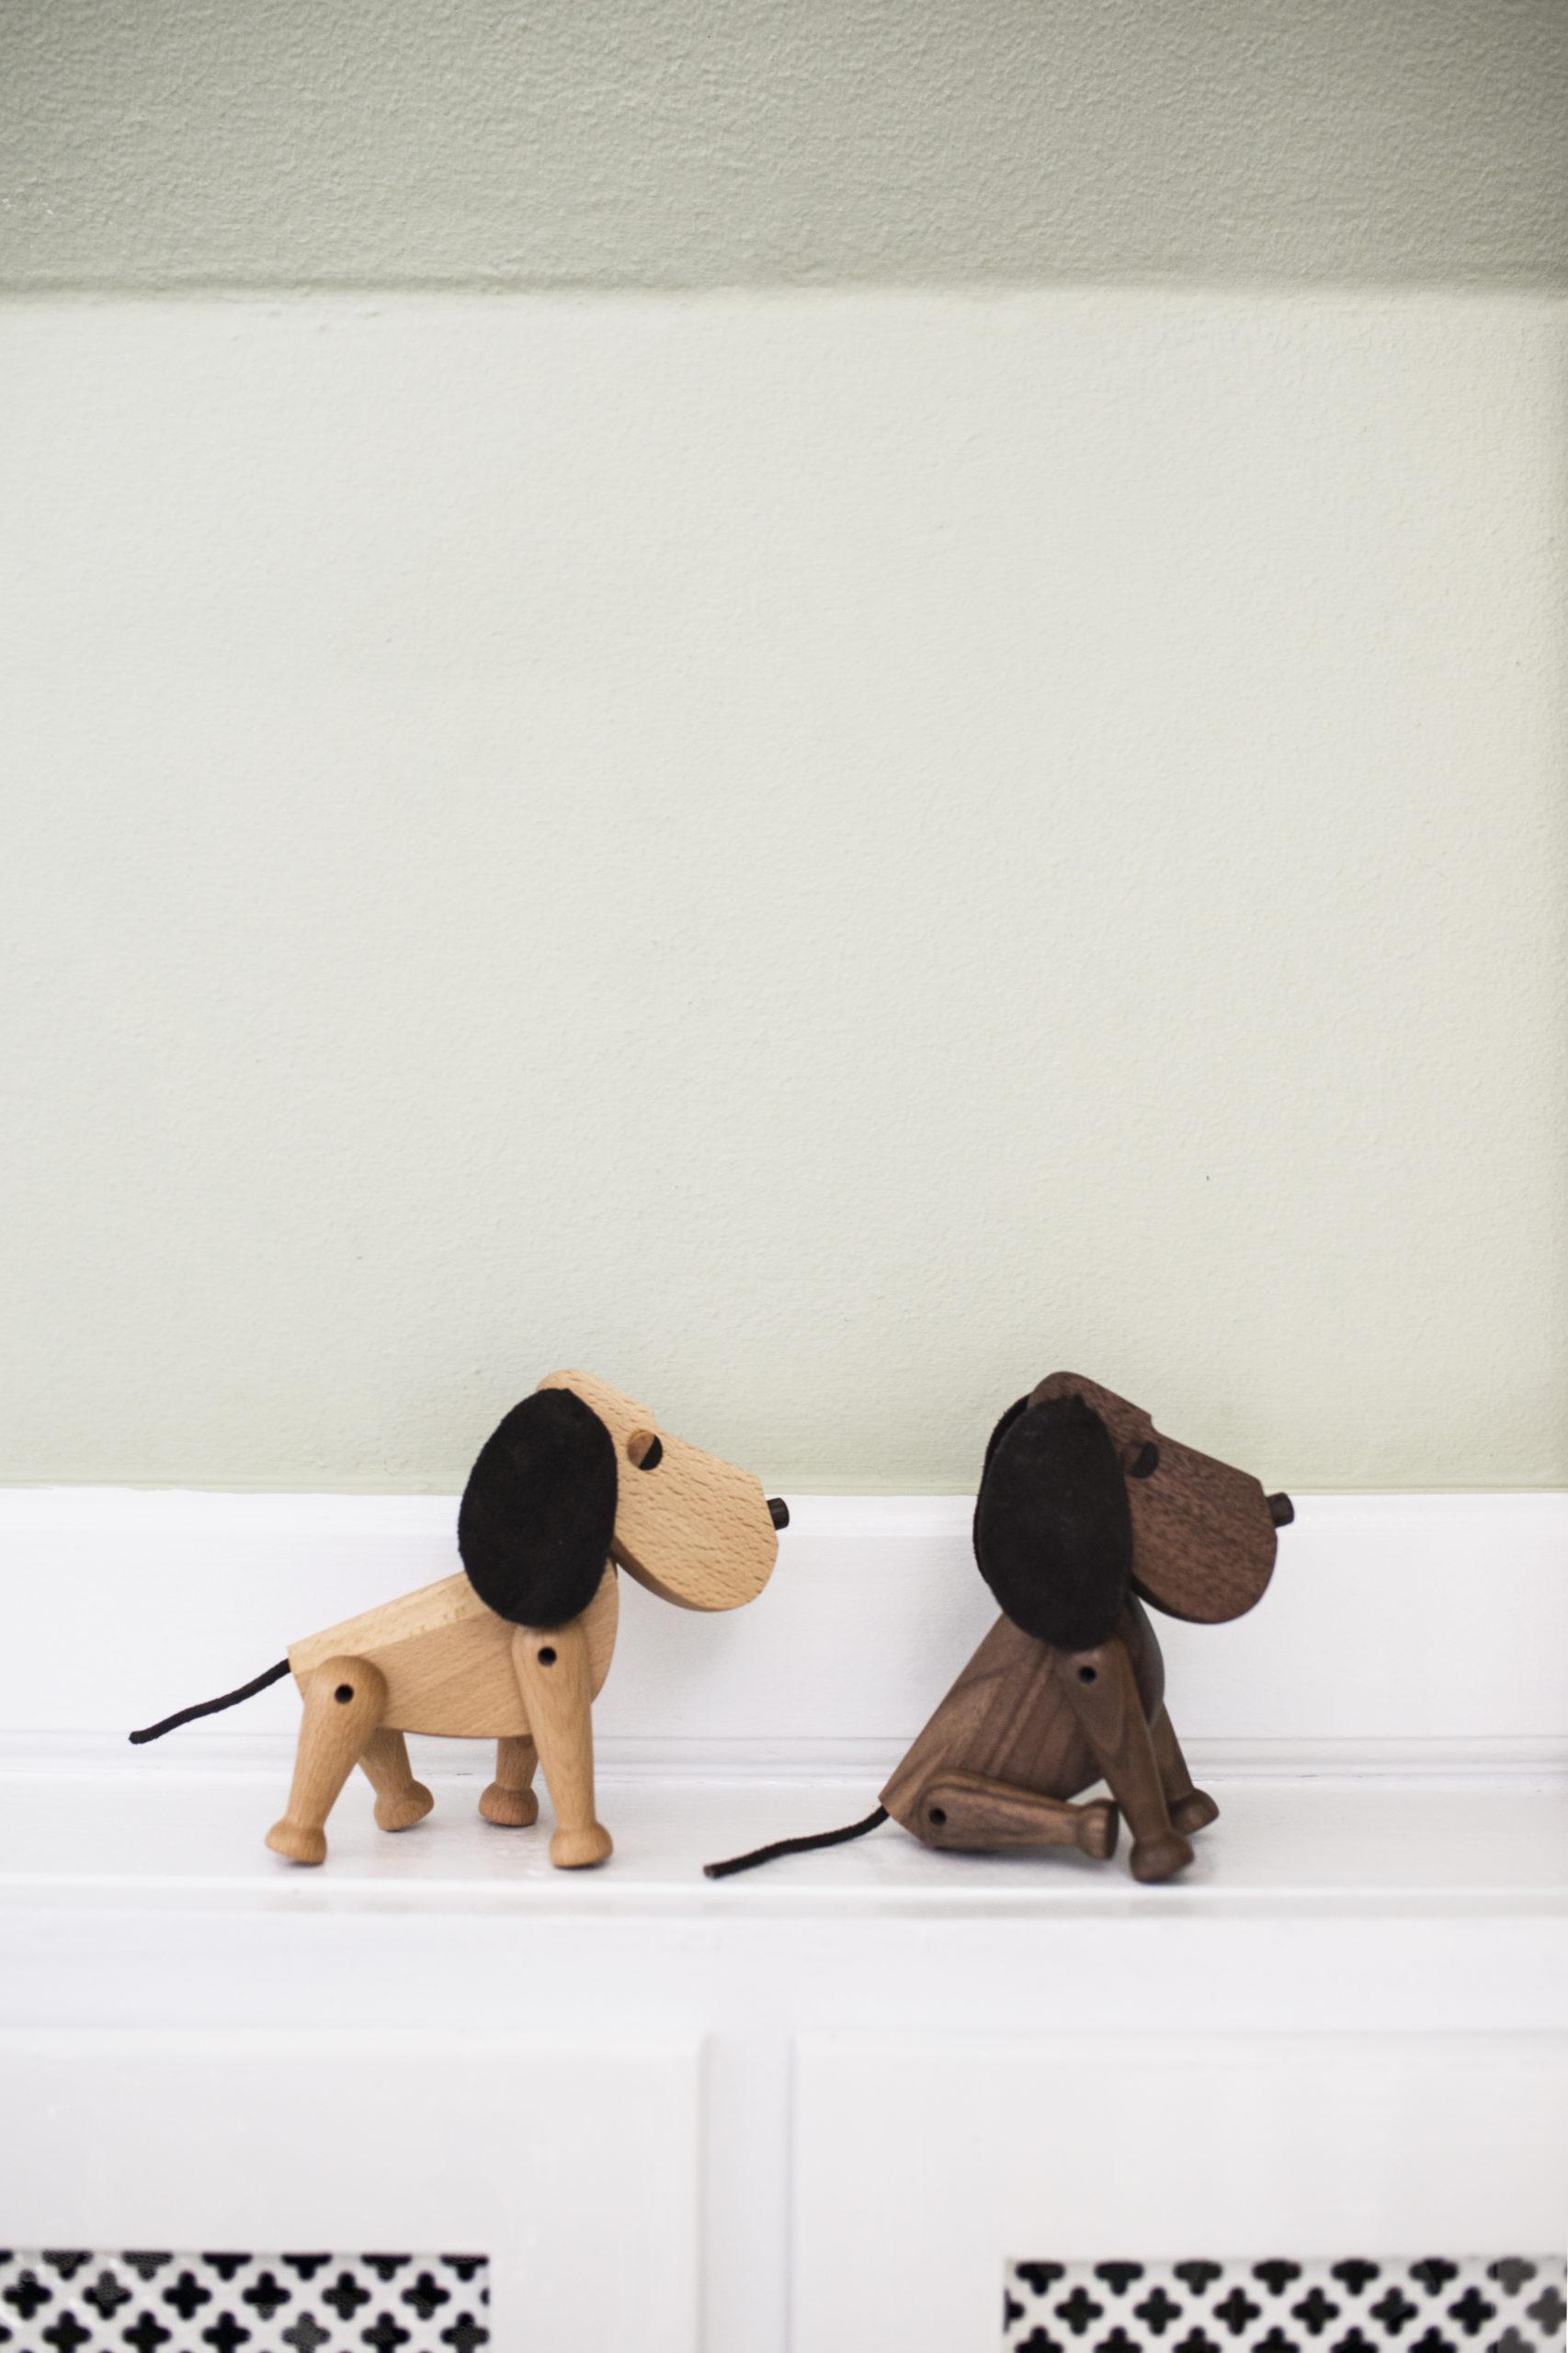 ARCHITECTMADE Oscar Bobby Beech Walnut Wood Dog Denmark Hans Bølling